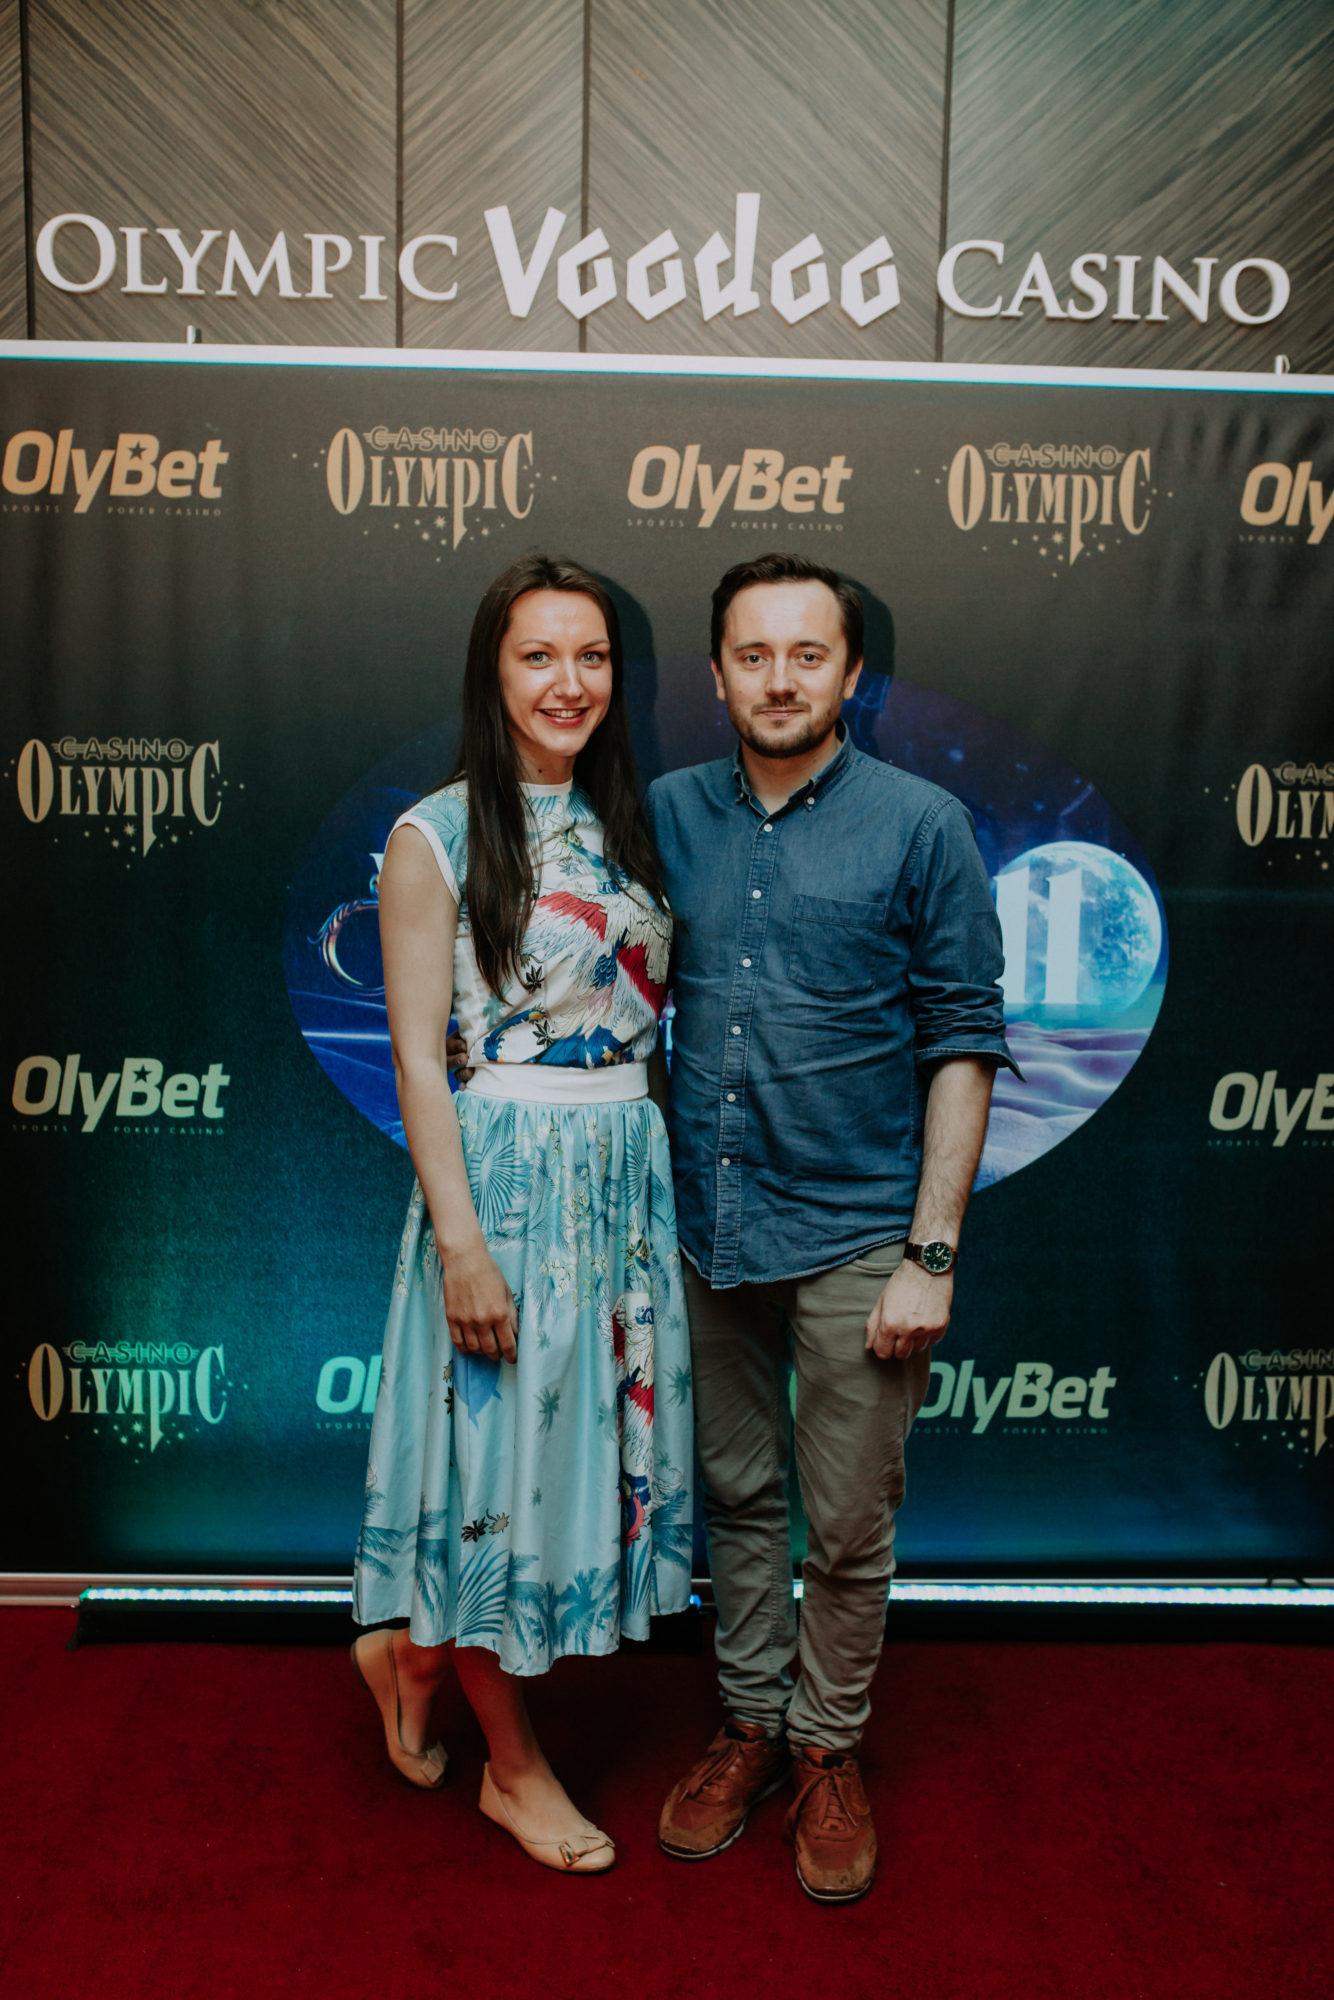 olympic voodoo casino 9 gadu jubileja